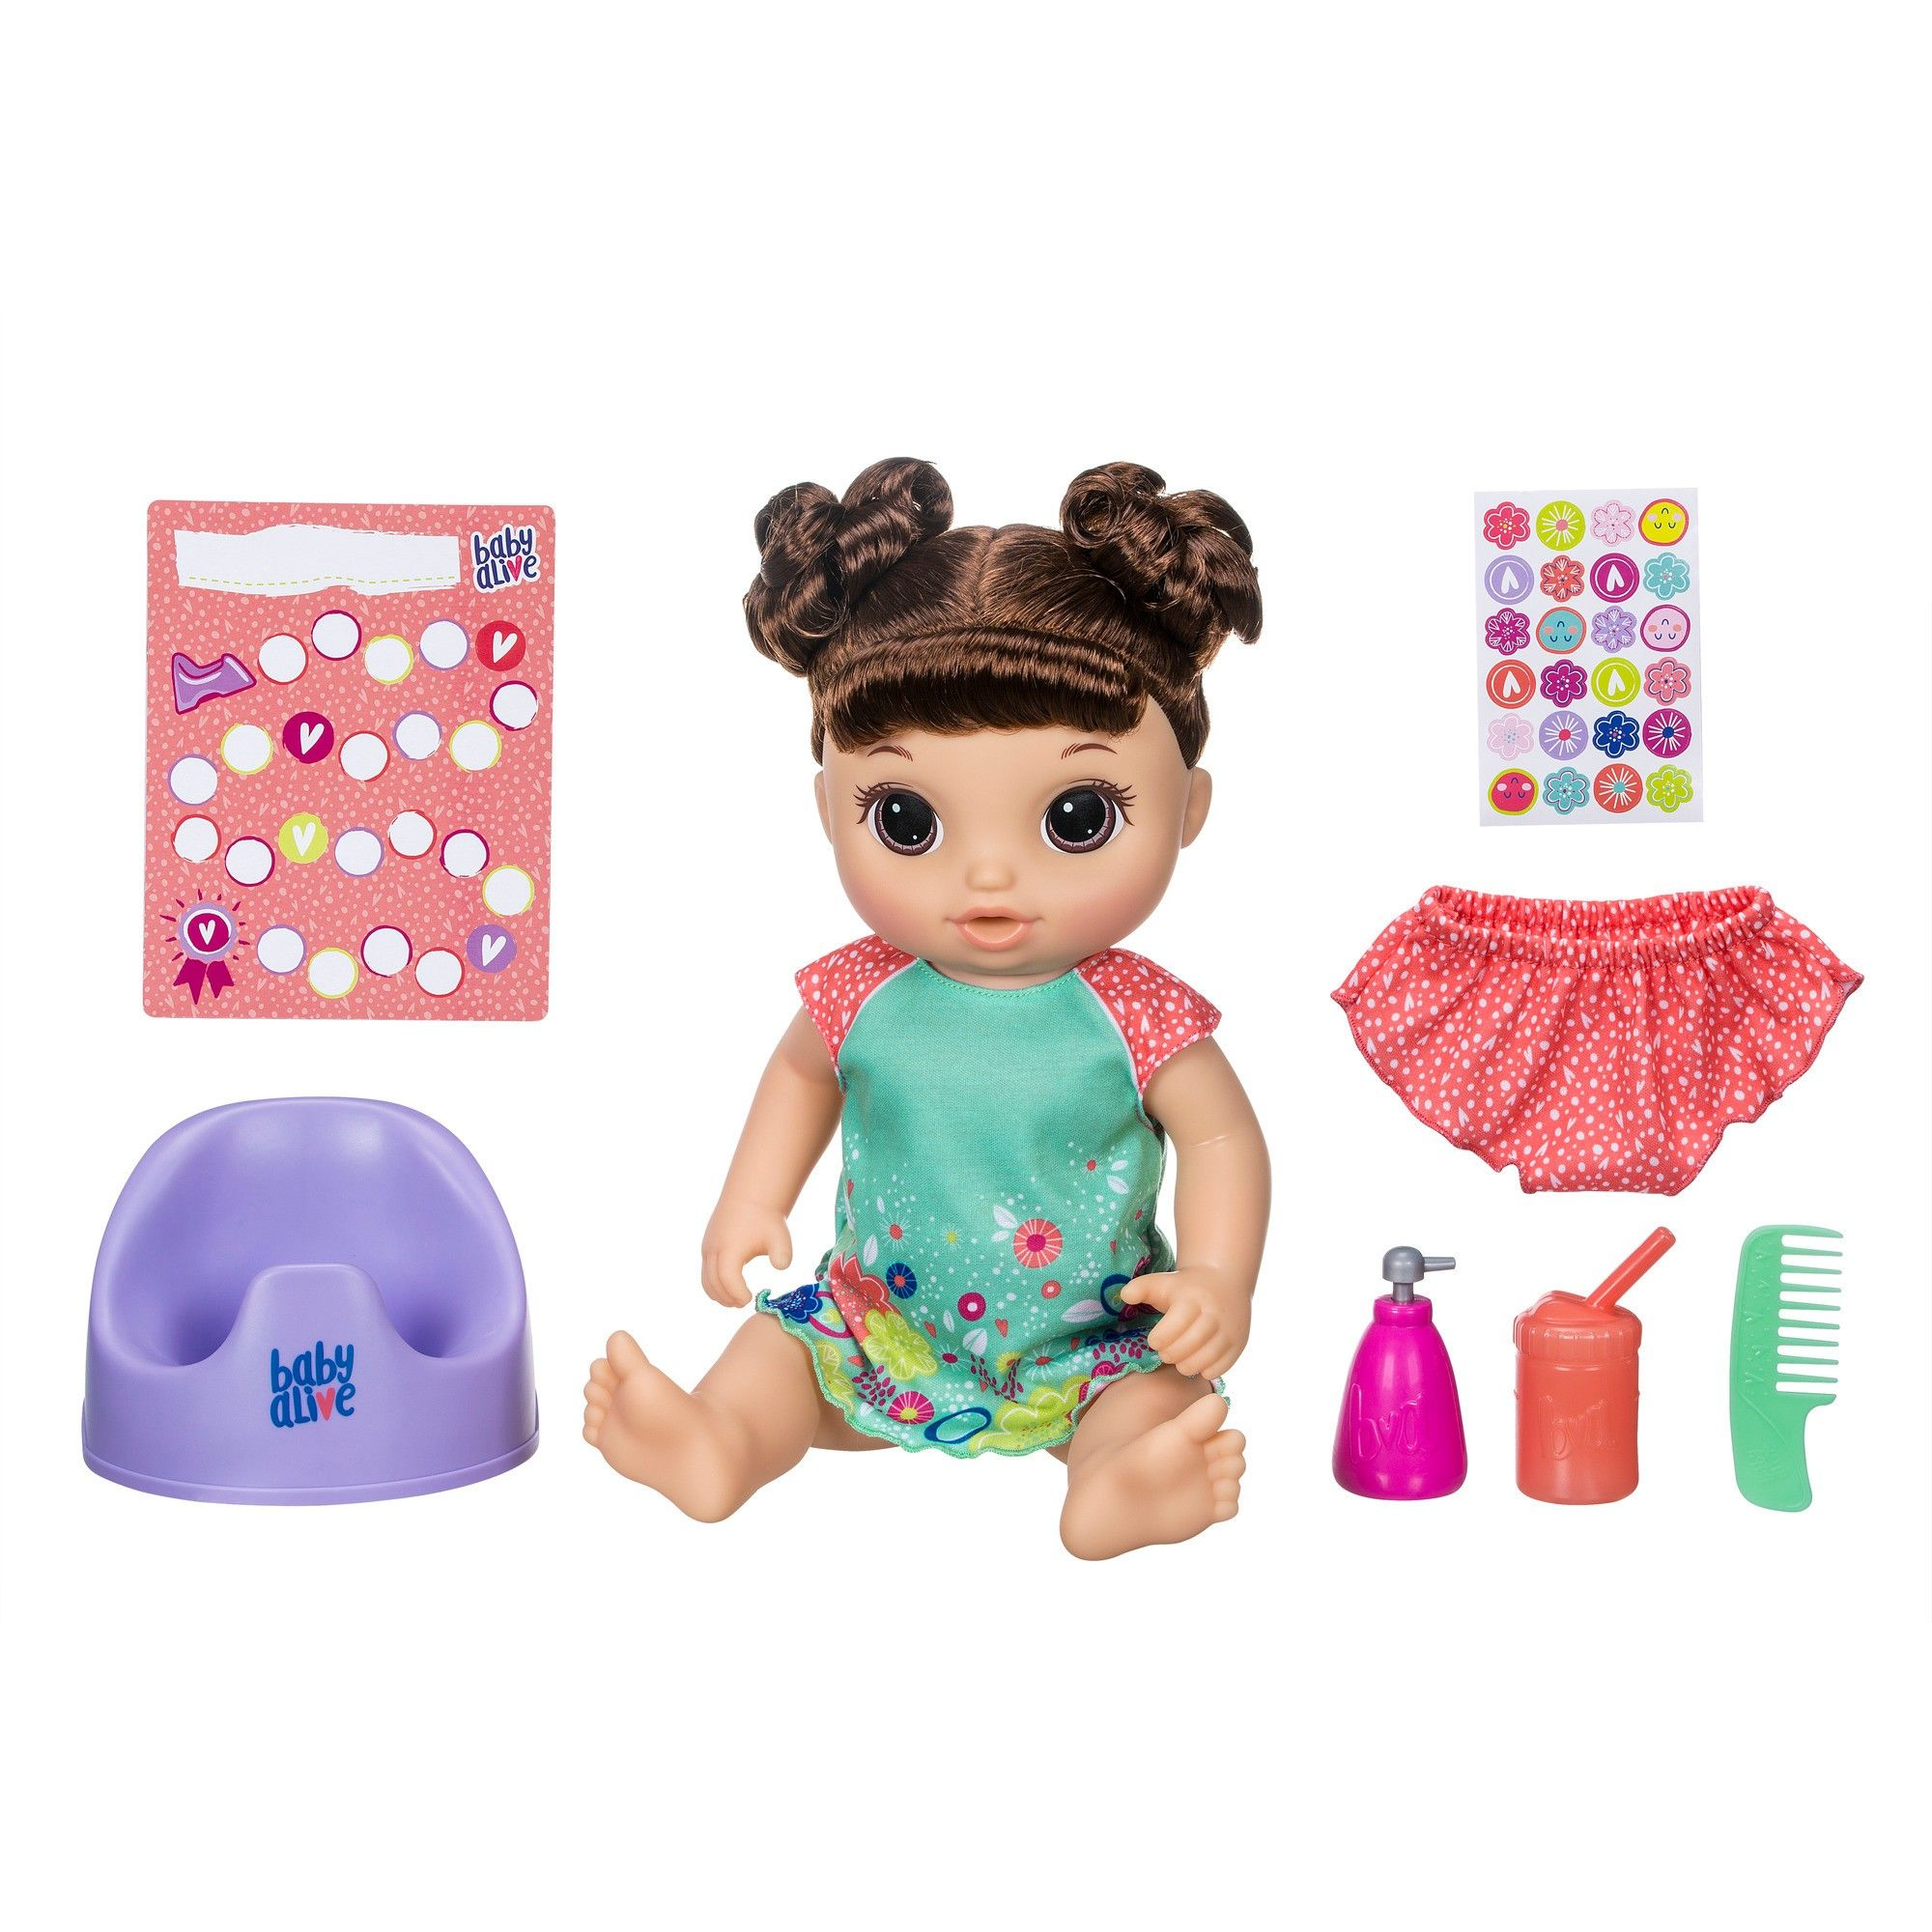 Baby Alive Potty Dance Baby Doll Baby Dolls Baby Alive Baby Alive Dolls